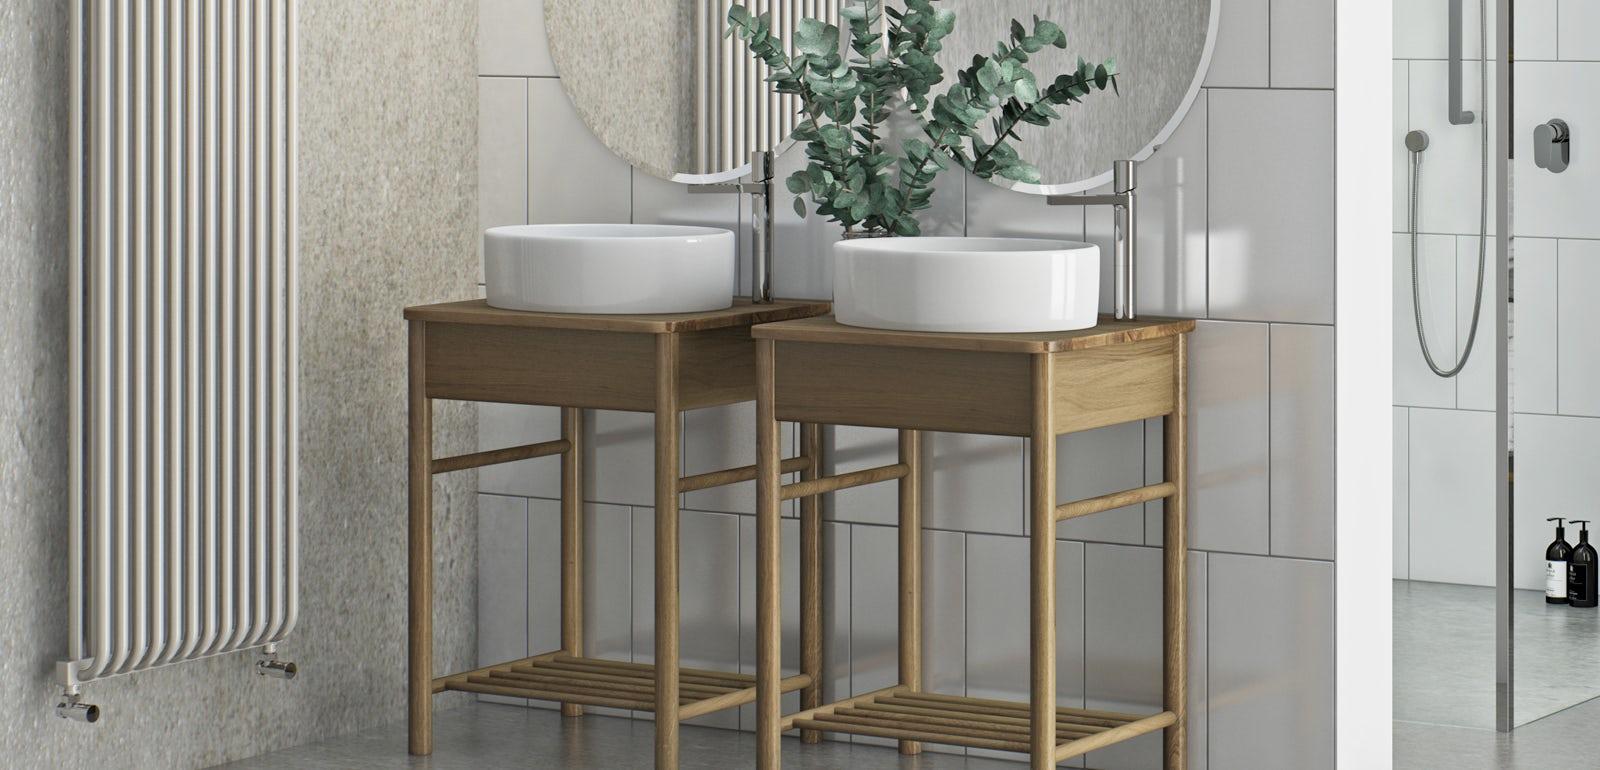 Countertop basin units